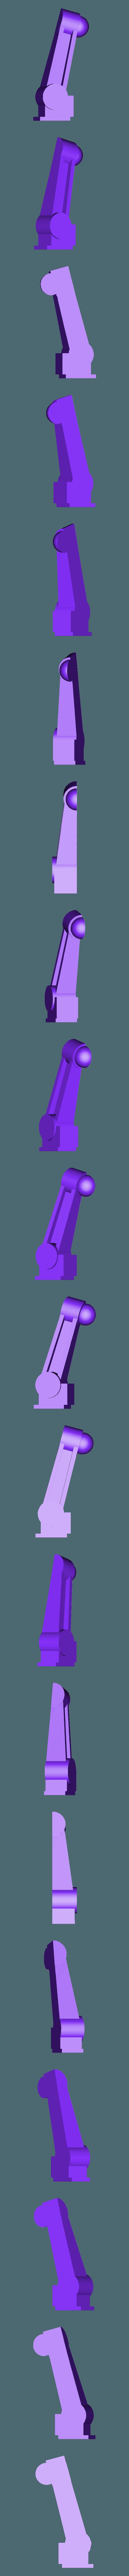 turantula_legs_2.stl Download free STL file Automated Weapon Platform Mod kit (Tarantula) • Model to 3D print, JtStrait72